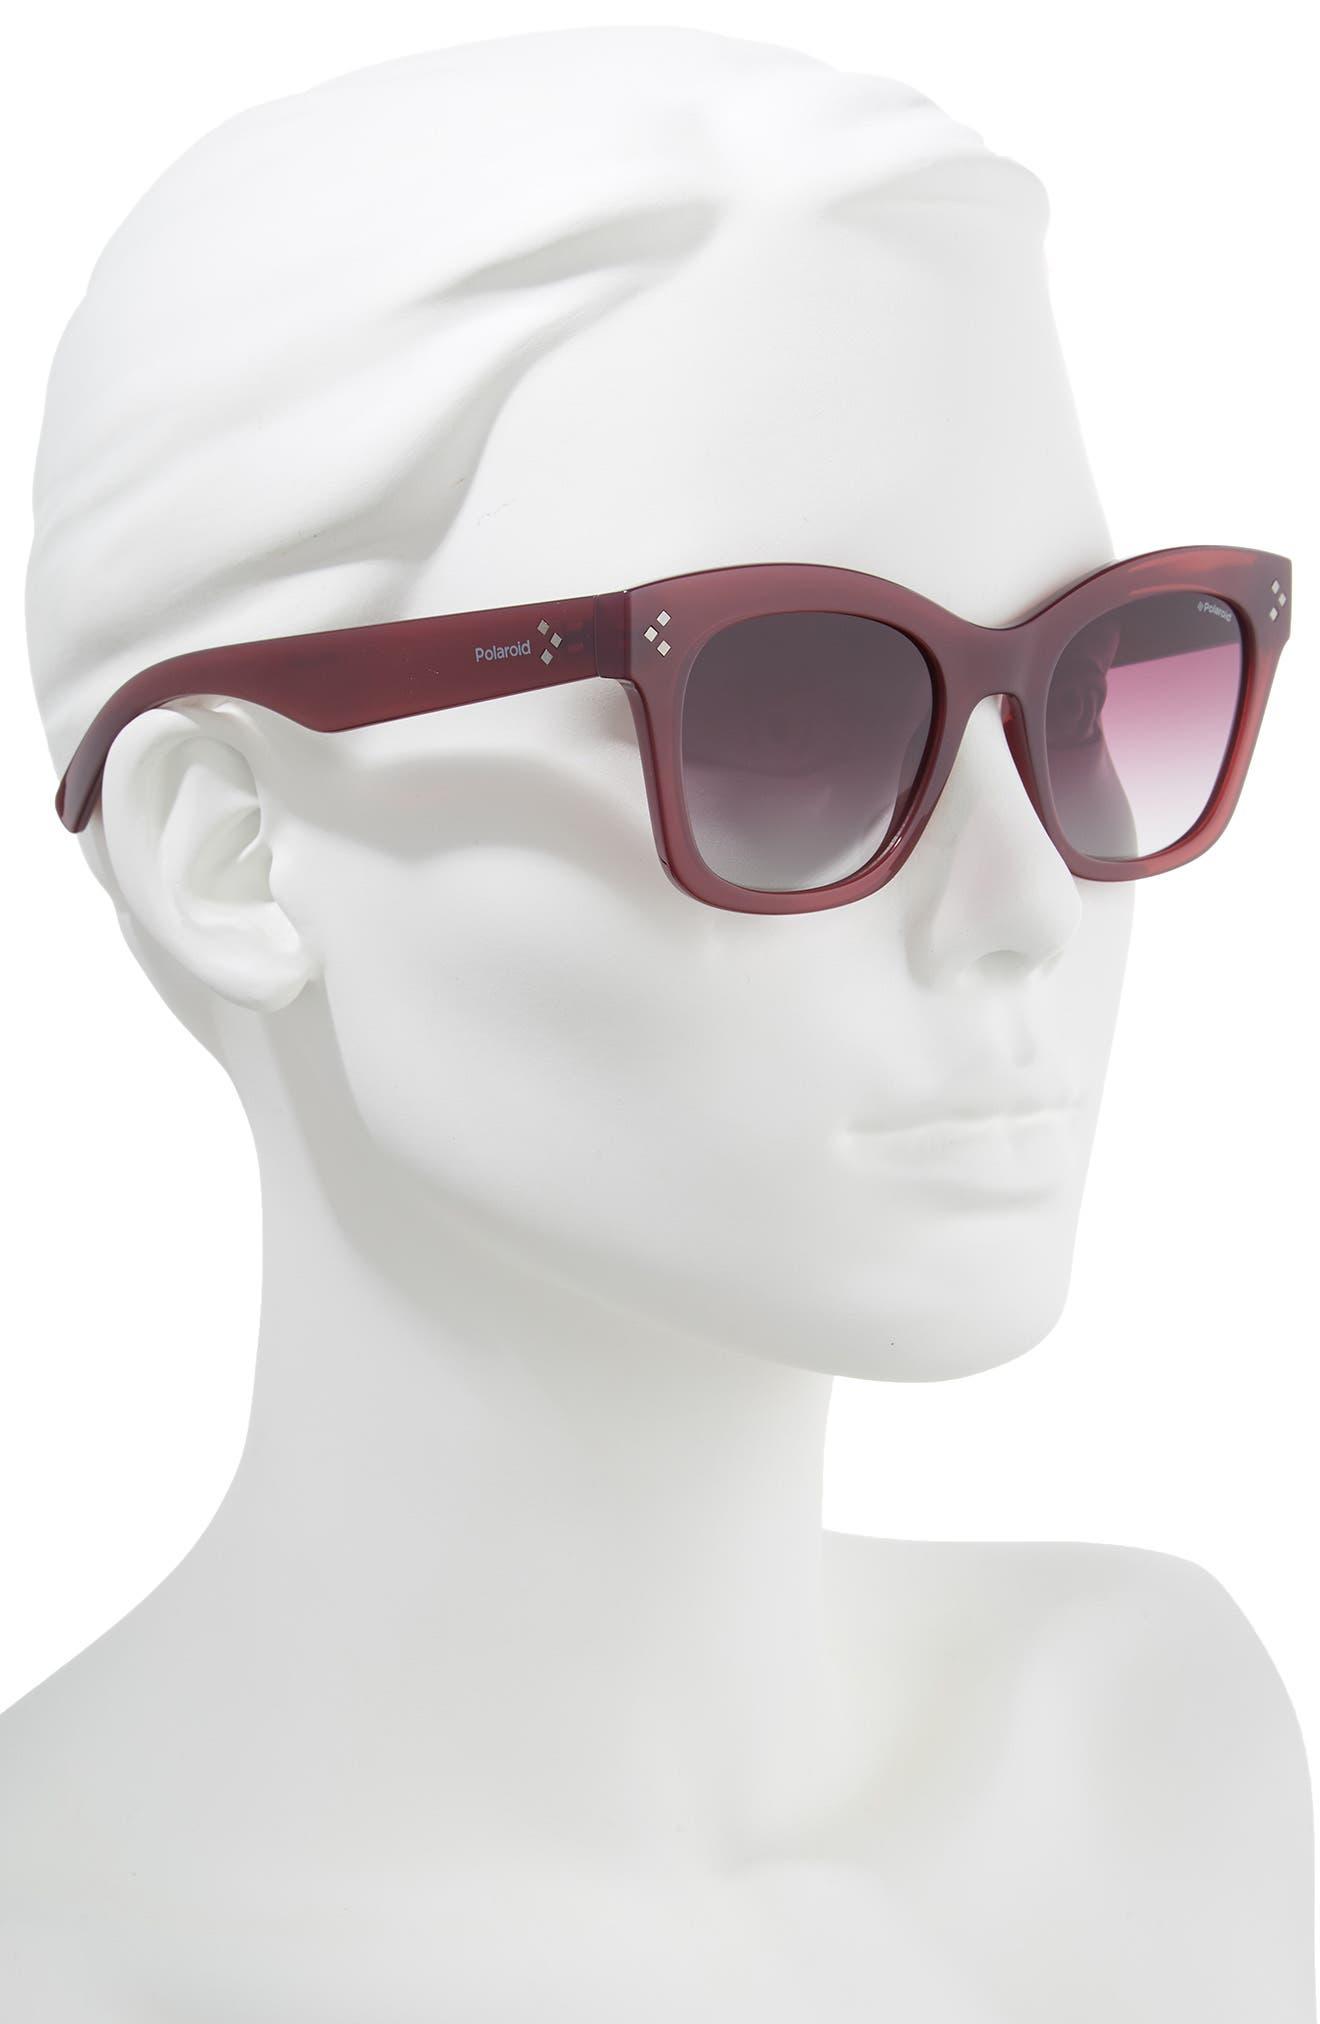 Core 51mm Polarized Sunglasses,                             Alternate thumbnail 8, color,